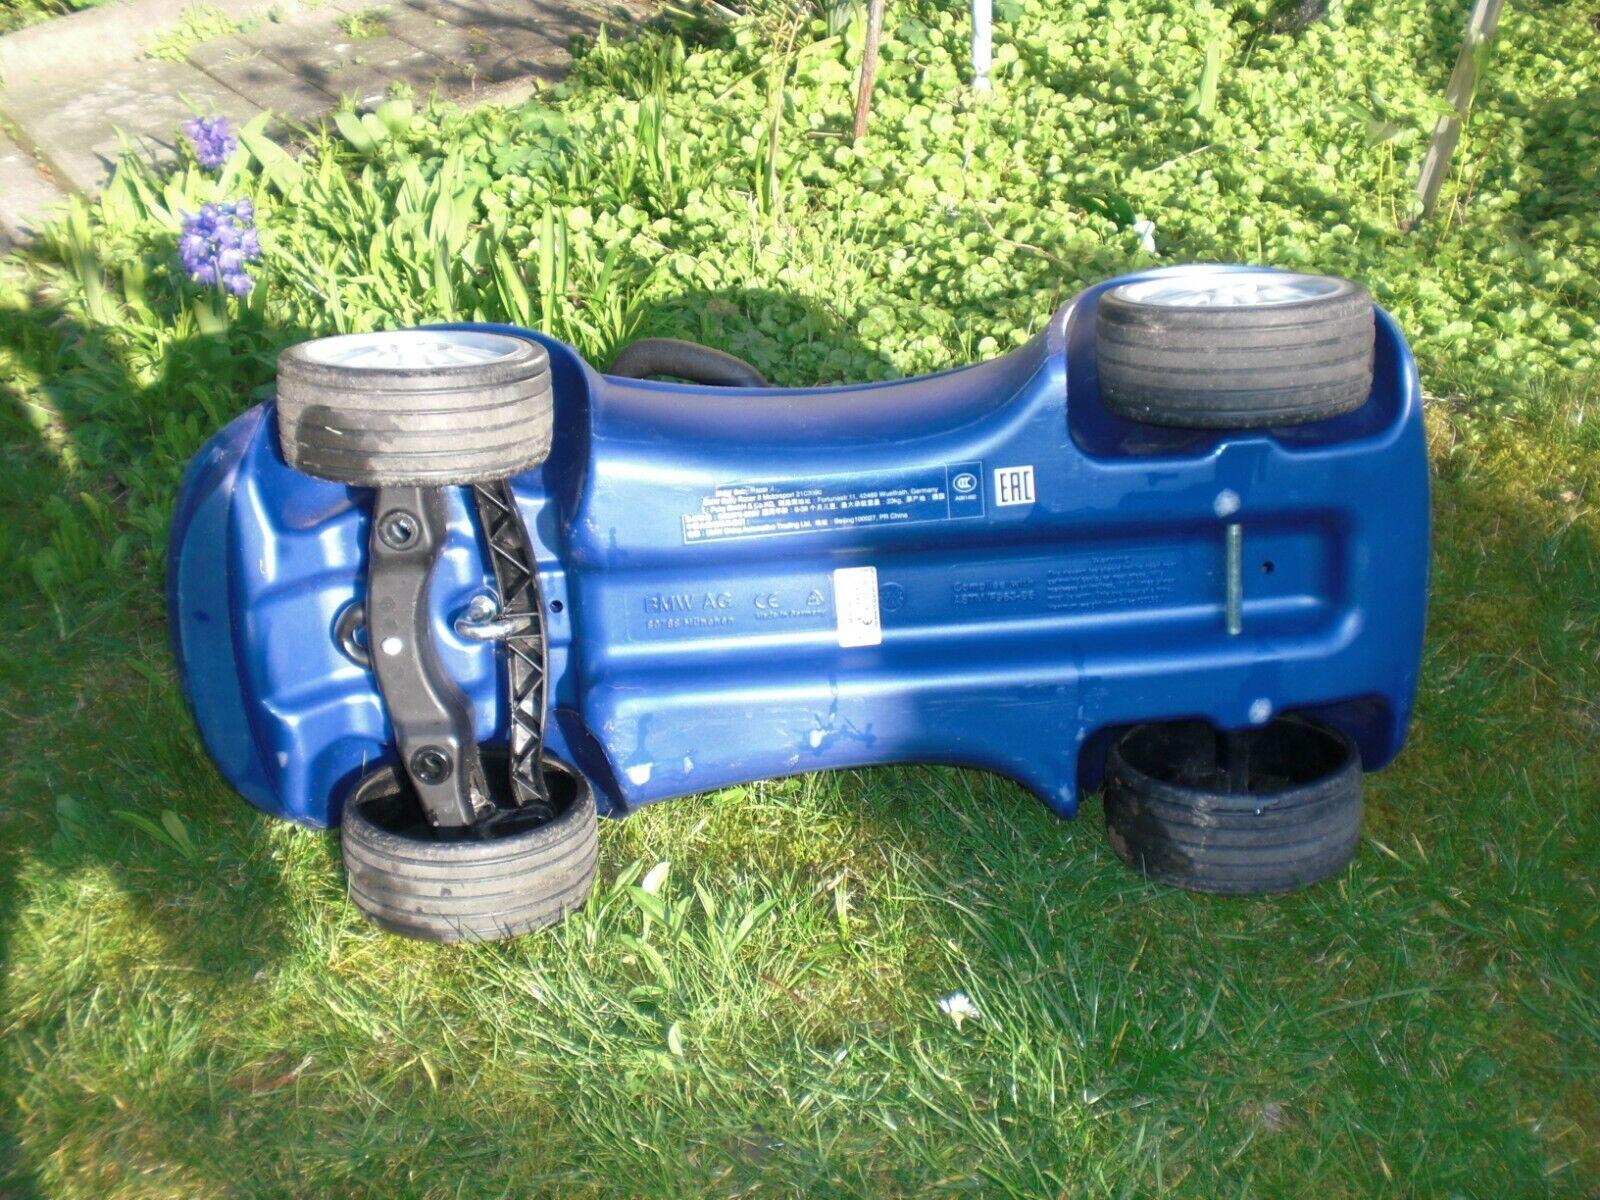 Original BMW Motorsport Baby Baby Baby Racer II blau weiß Mathis Racing Team Puky Rutscher 6a2625